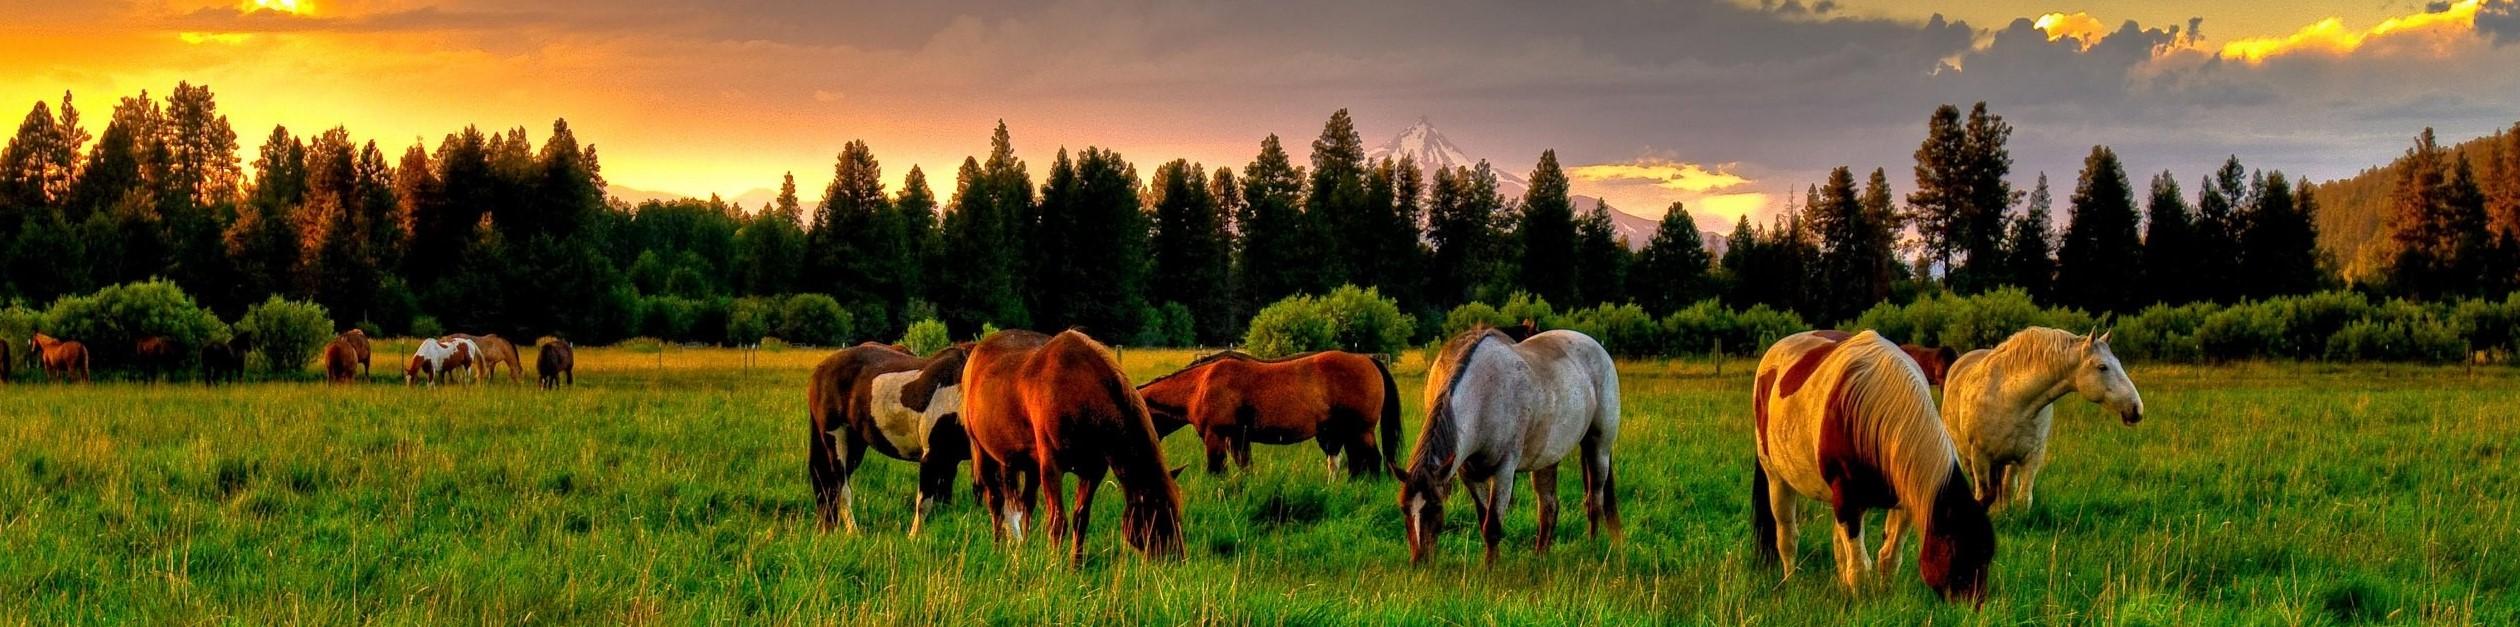 Vinyl Fencing For Horses